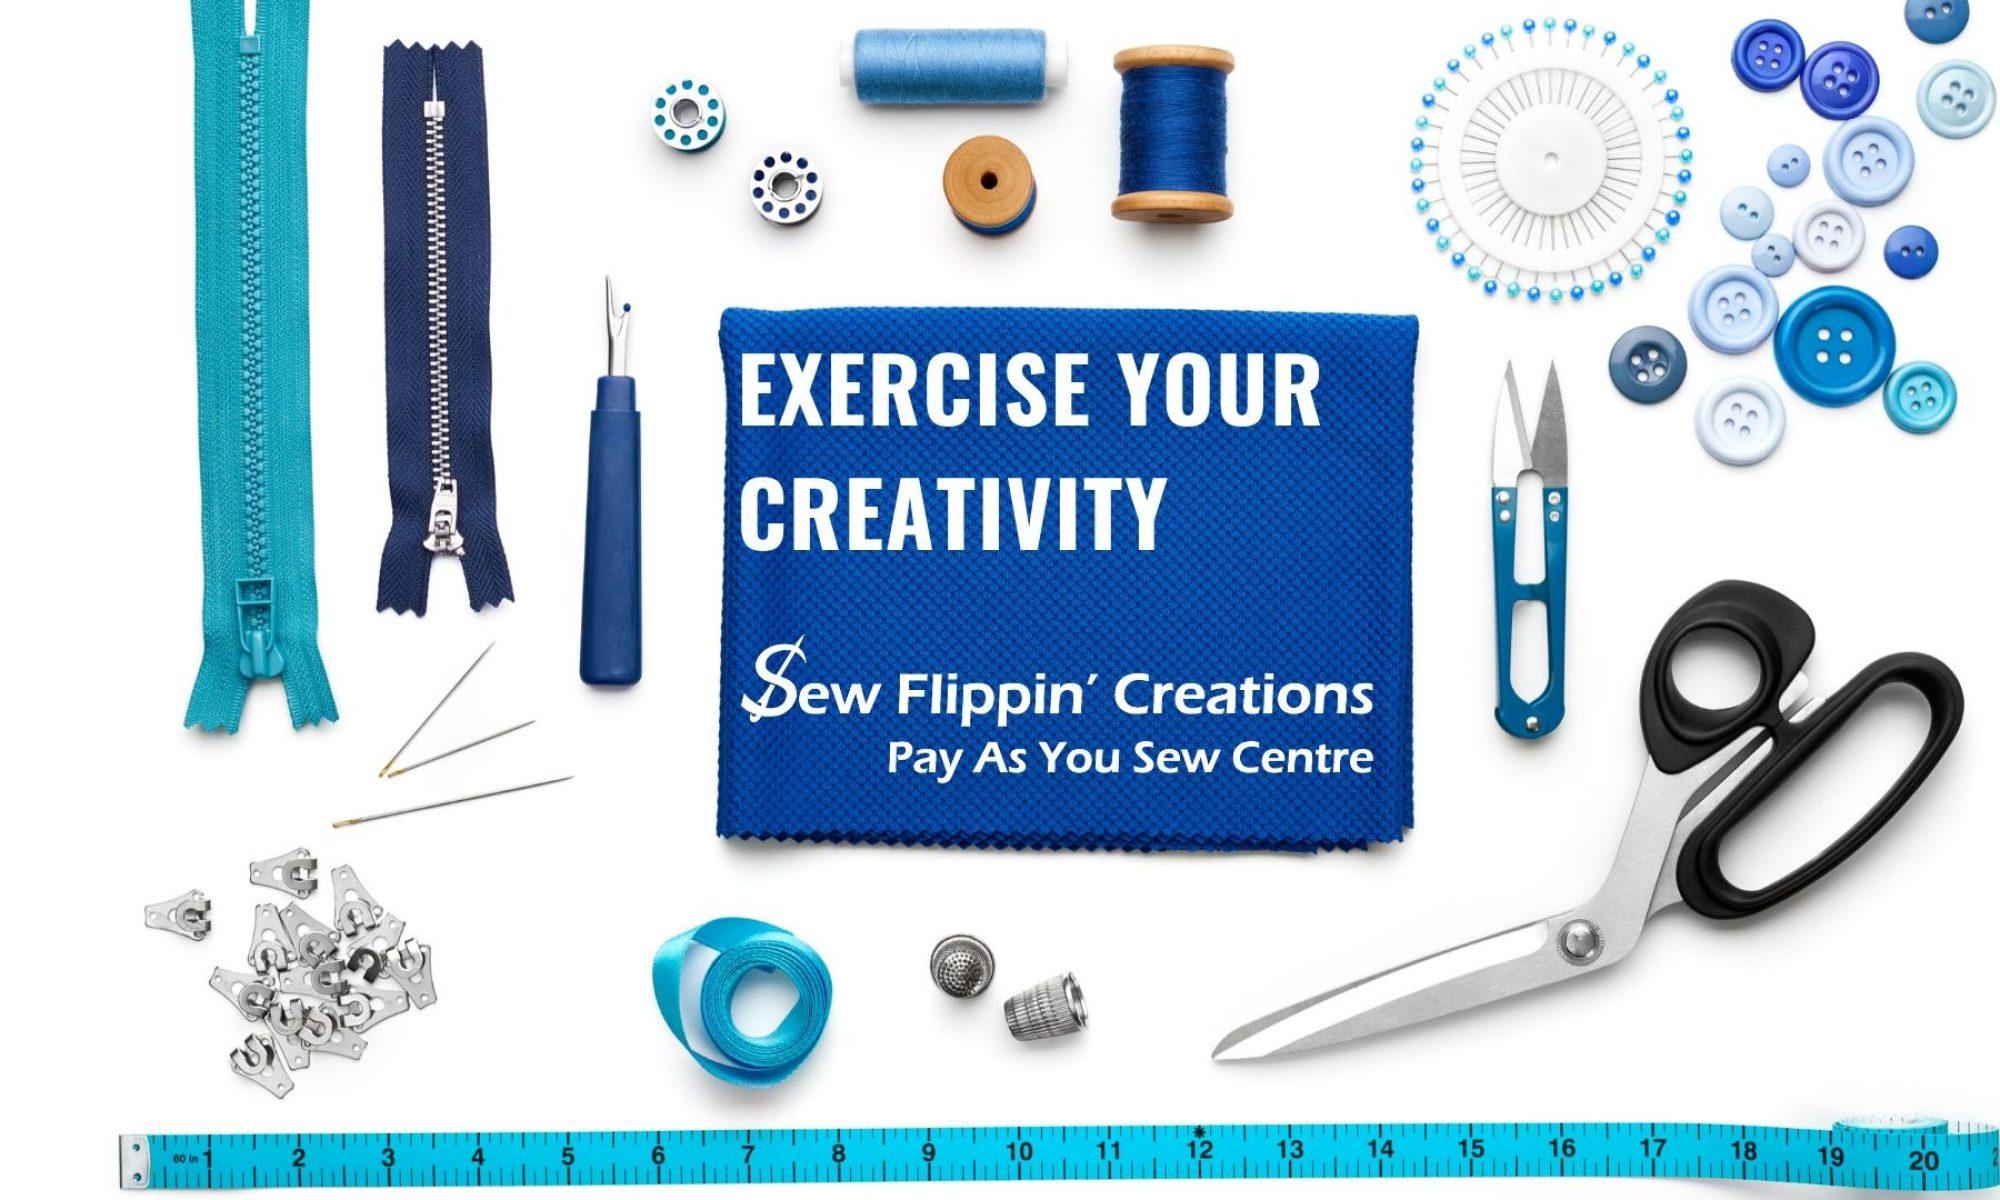 Sew Flippin' Creations